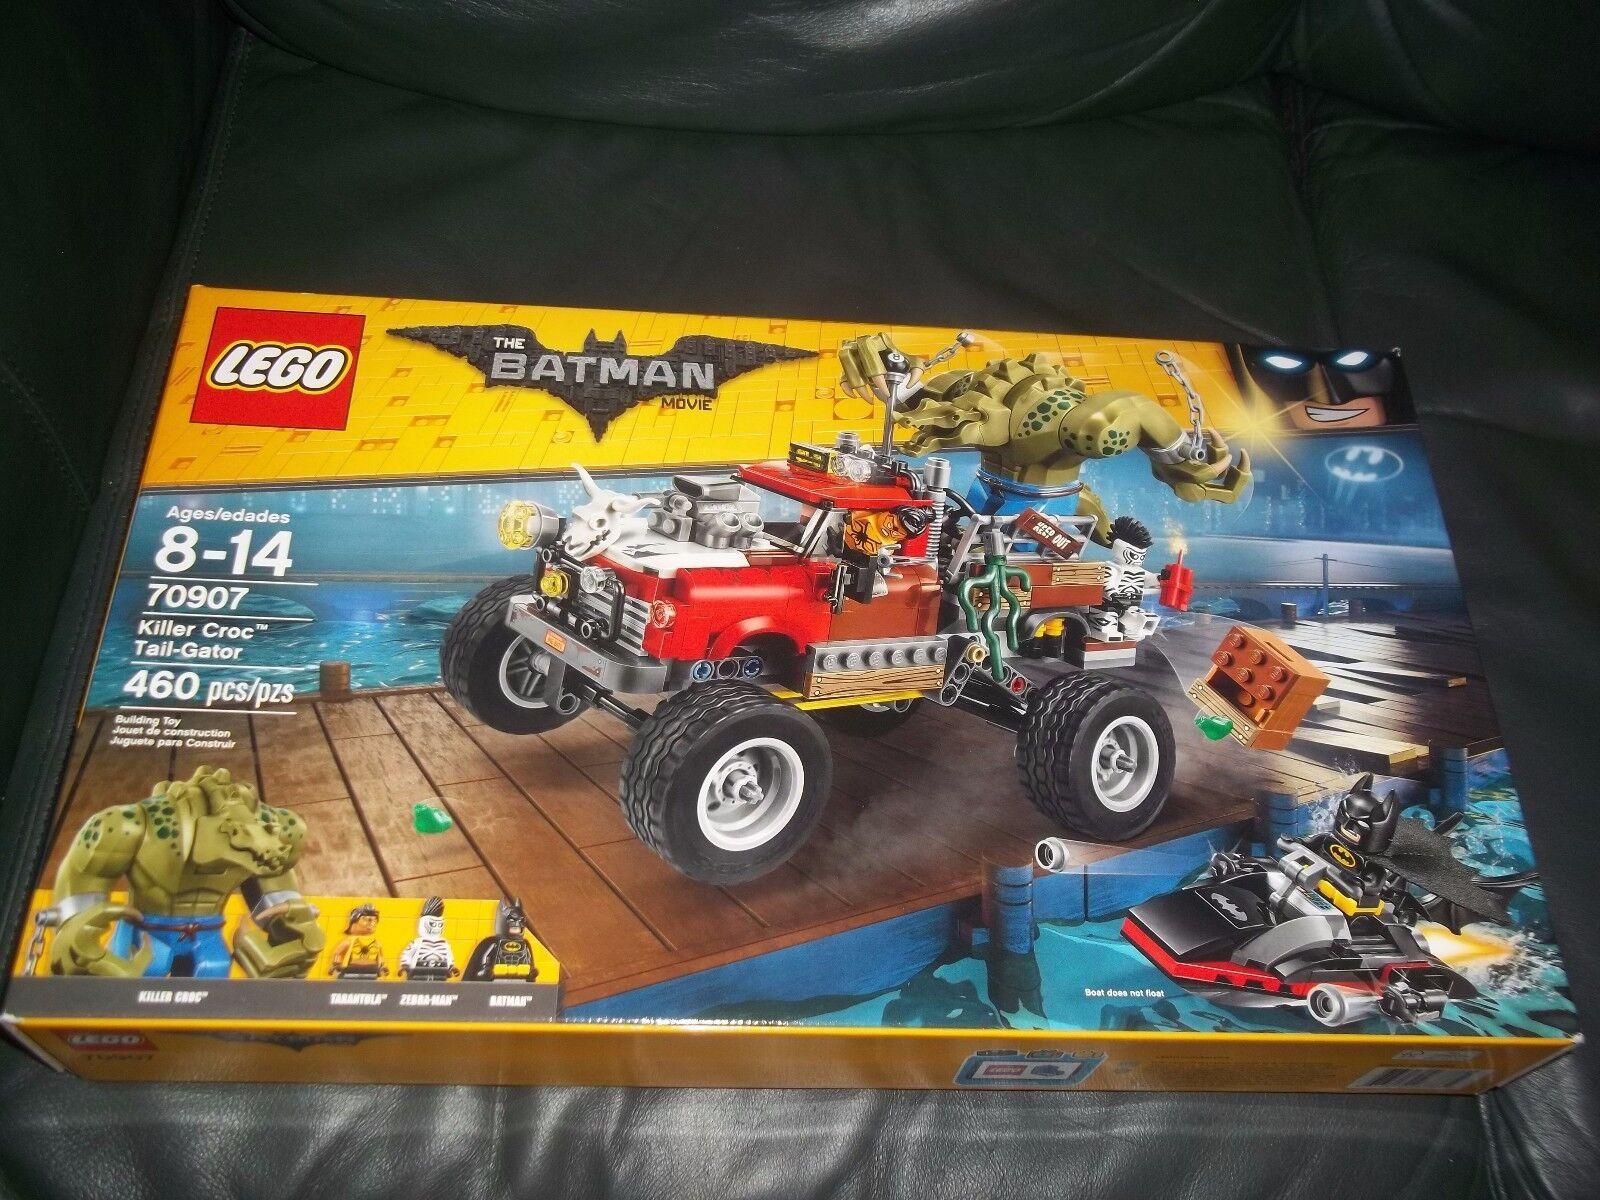 LEGO Batman Movie Killer Croc Tail-Gator 70907 Zebra Man, Trantula New